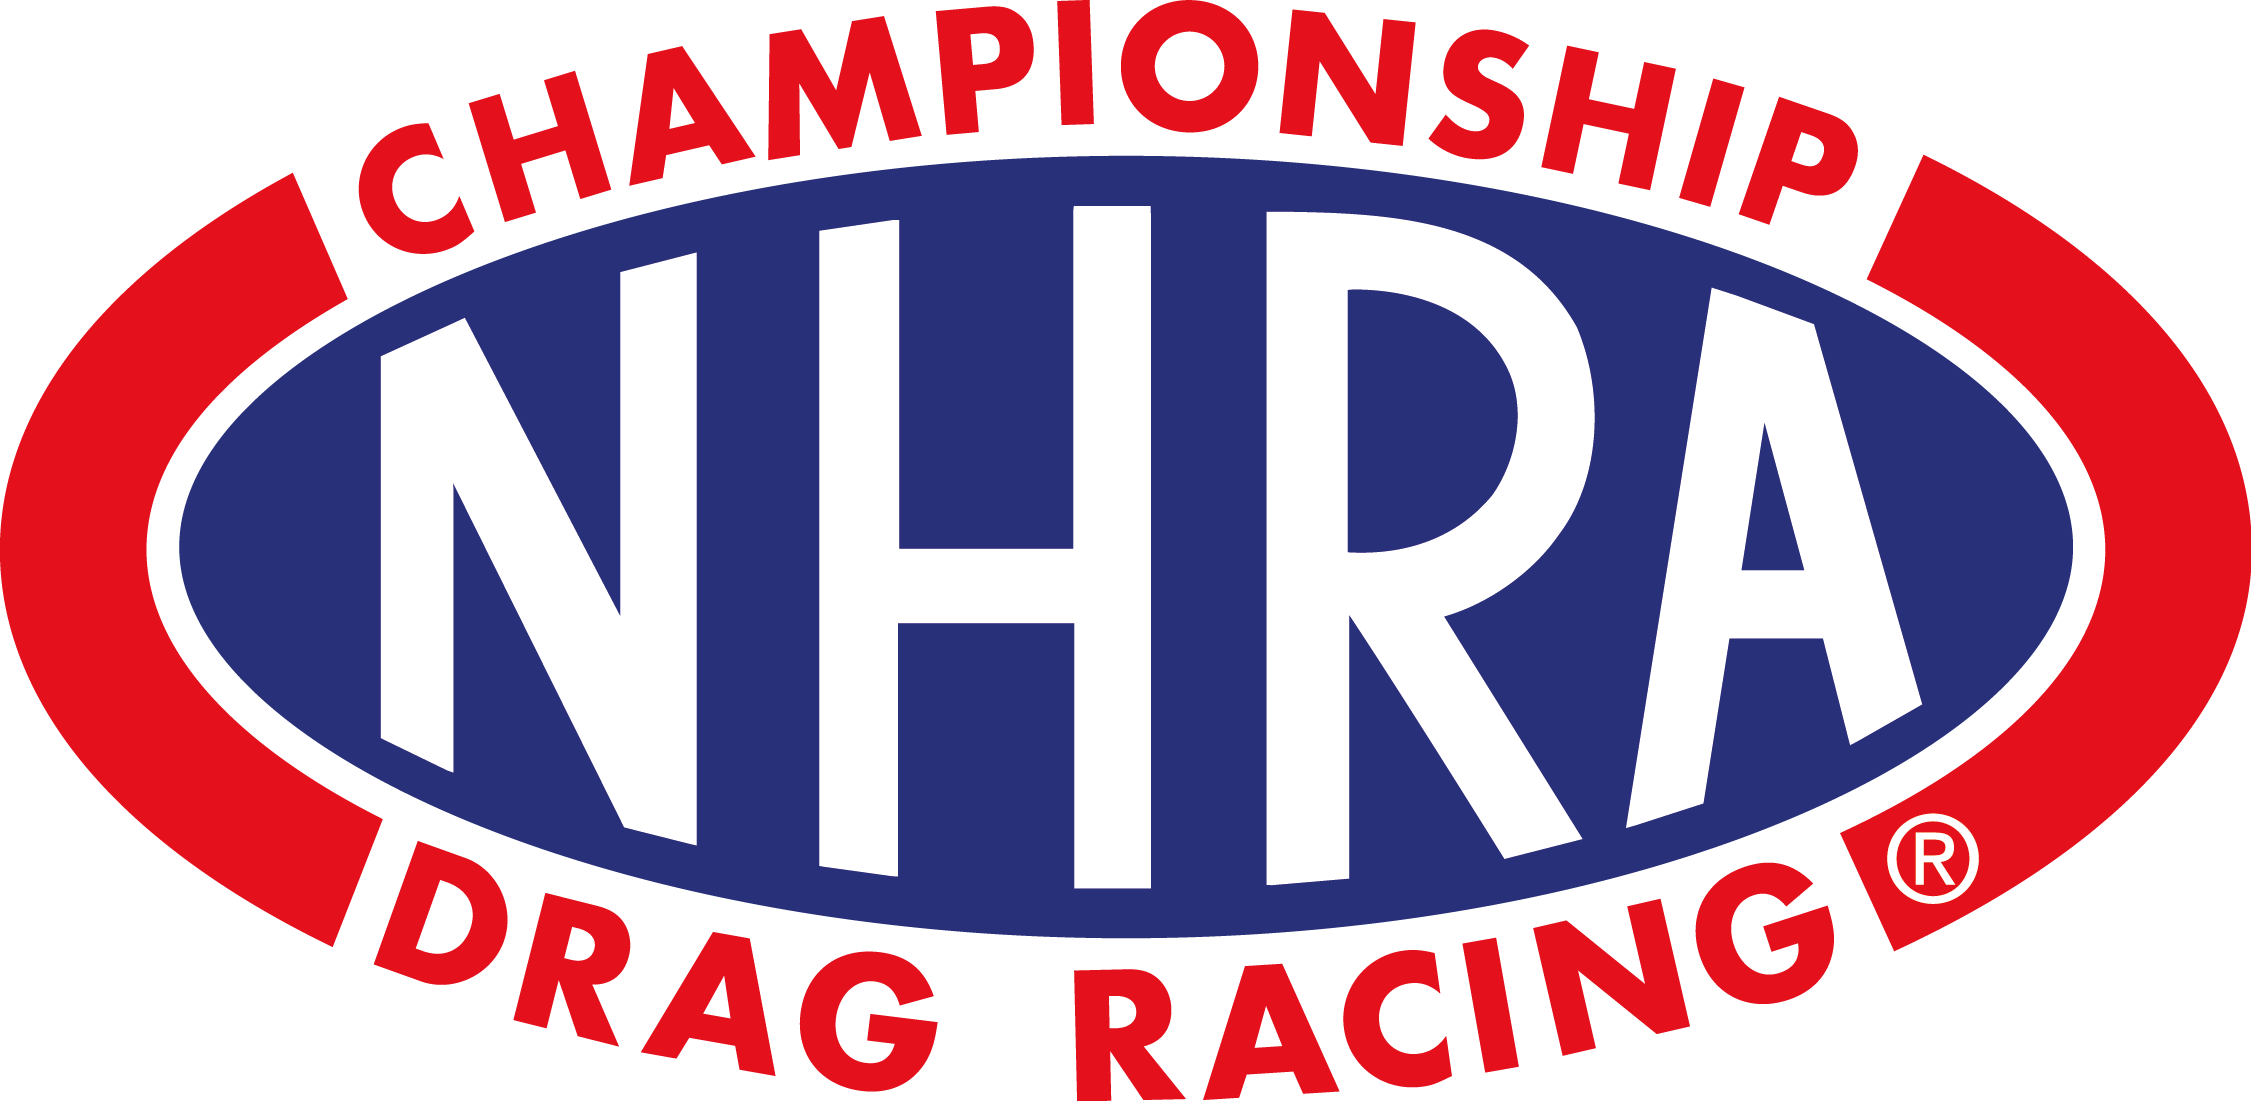 National Hot Rod Association (NHRA) Logo